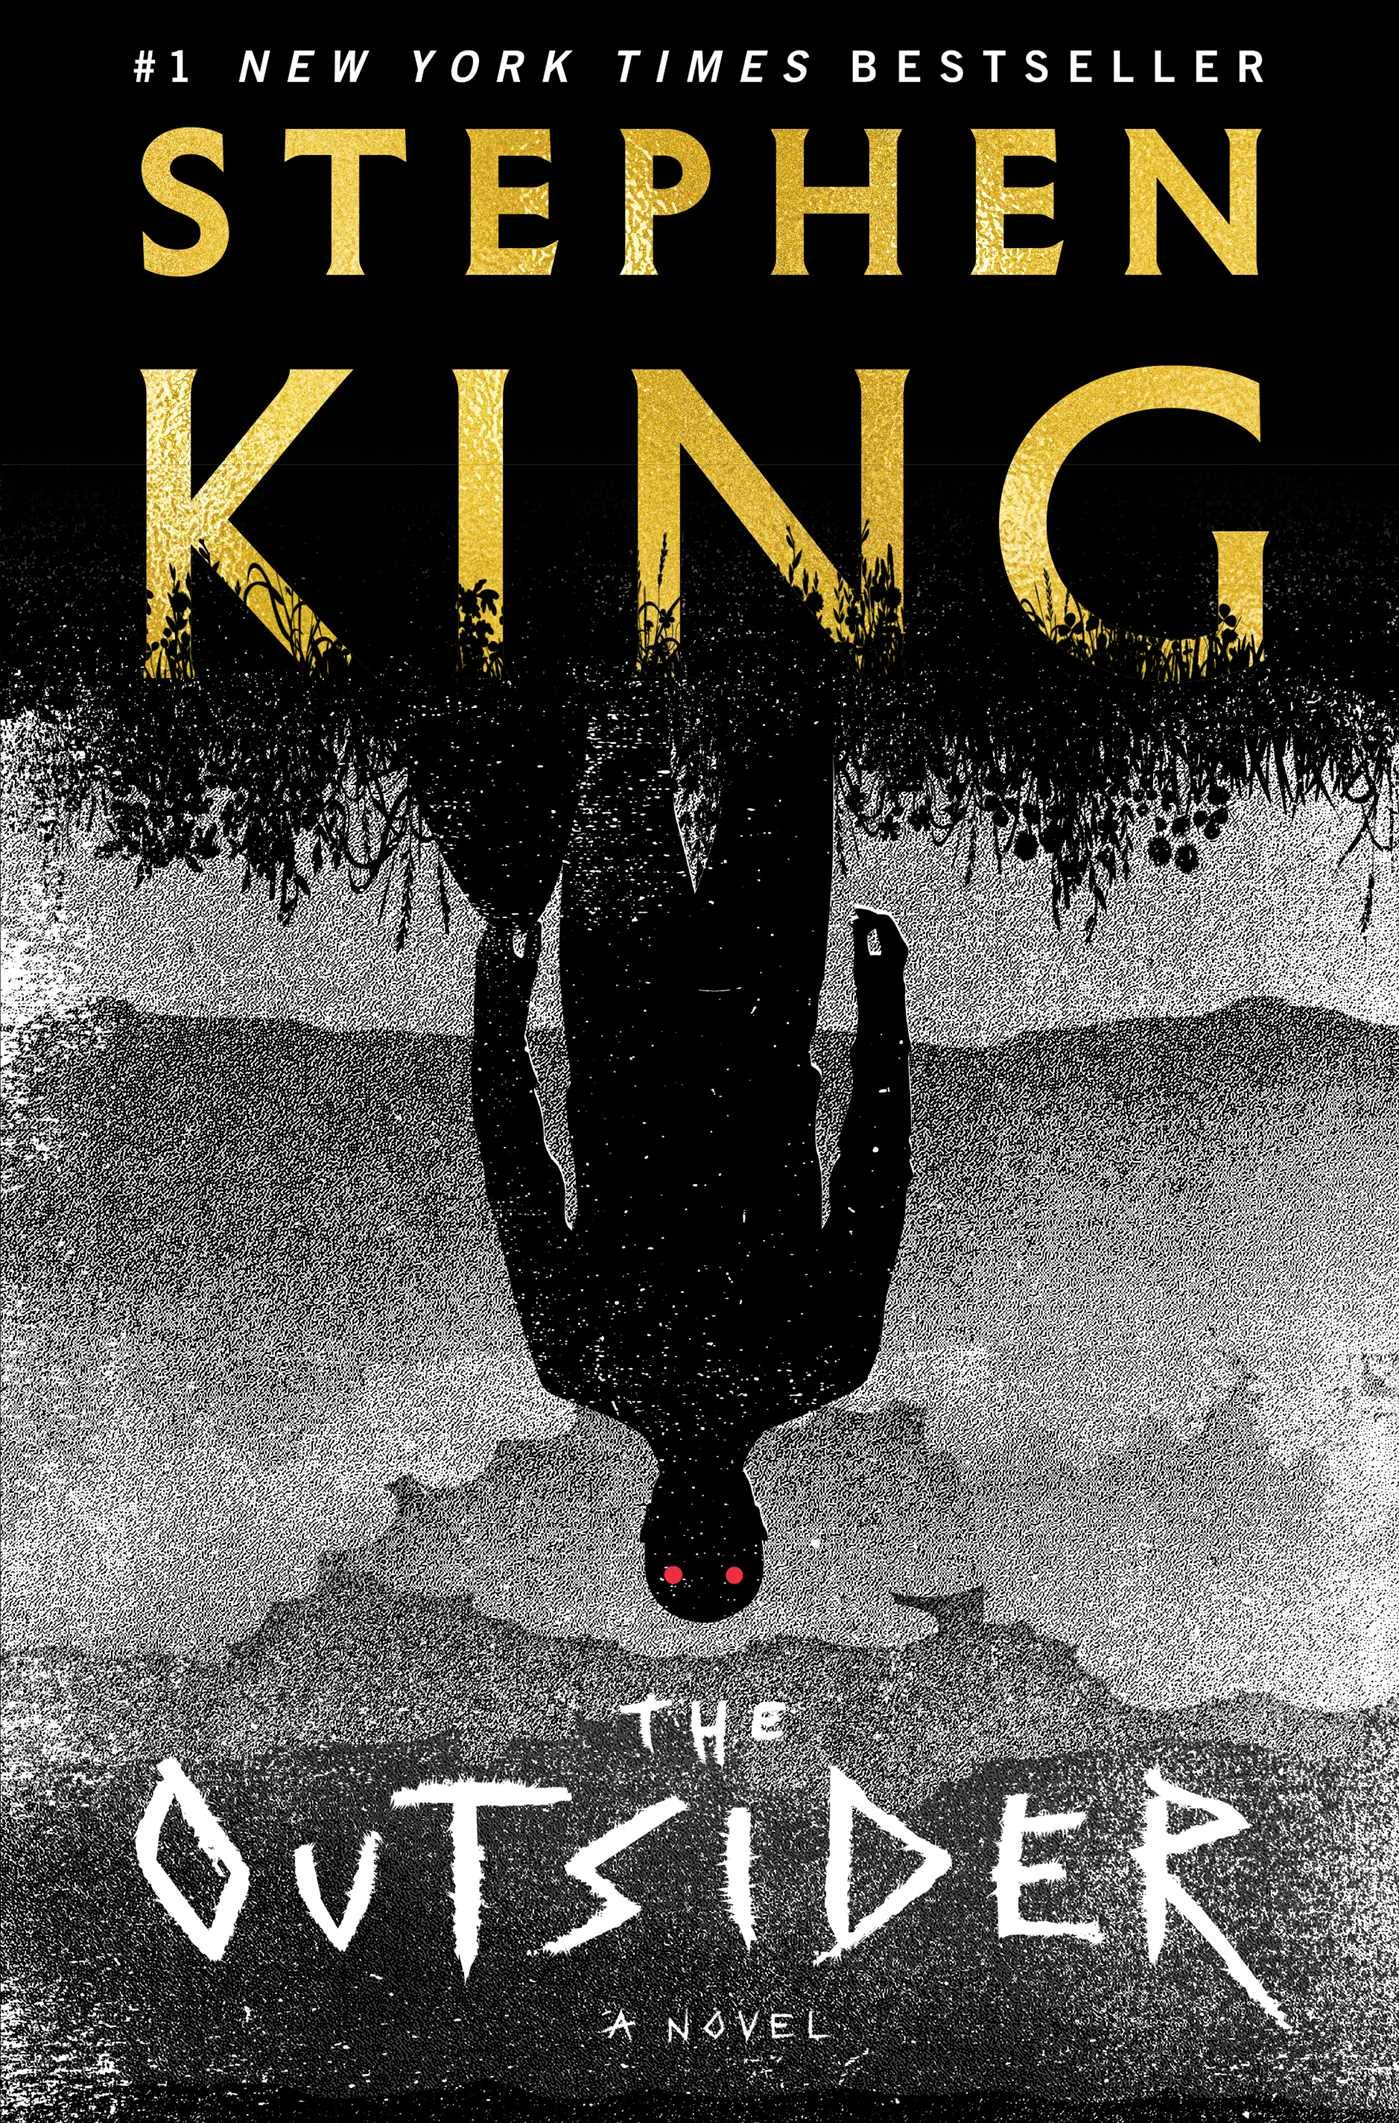 The Outsider (novel)